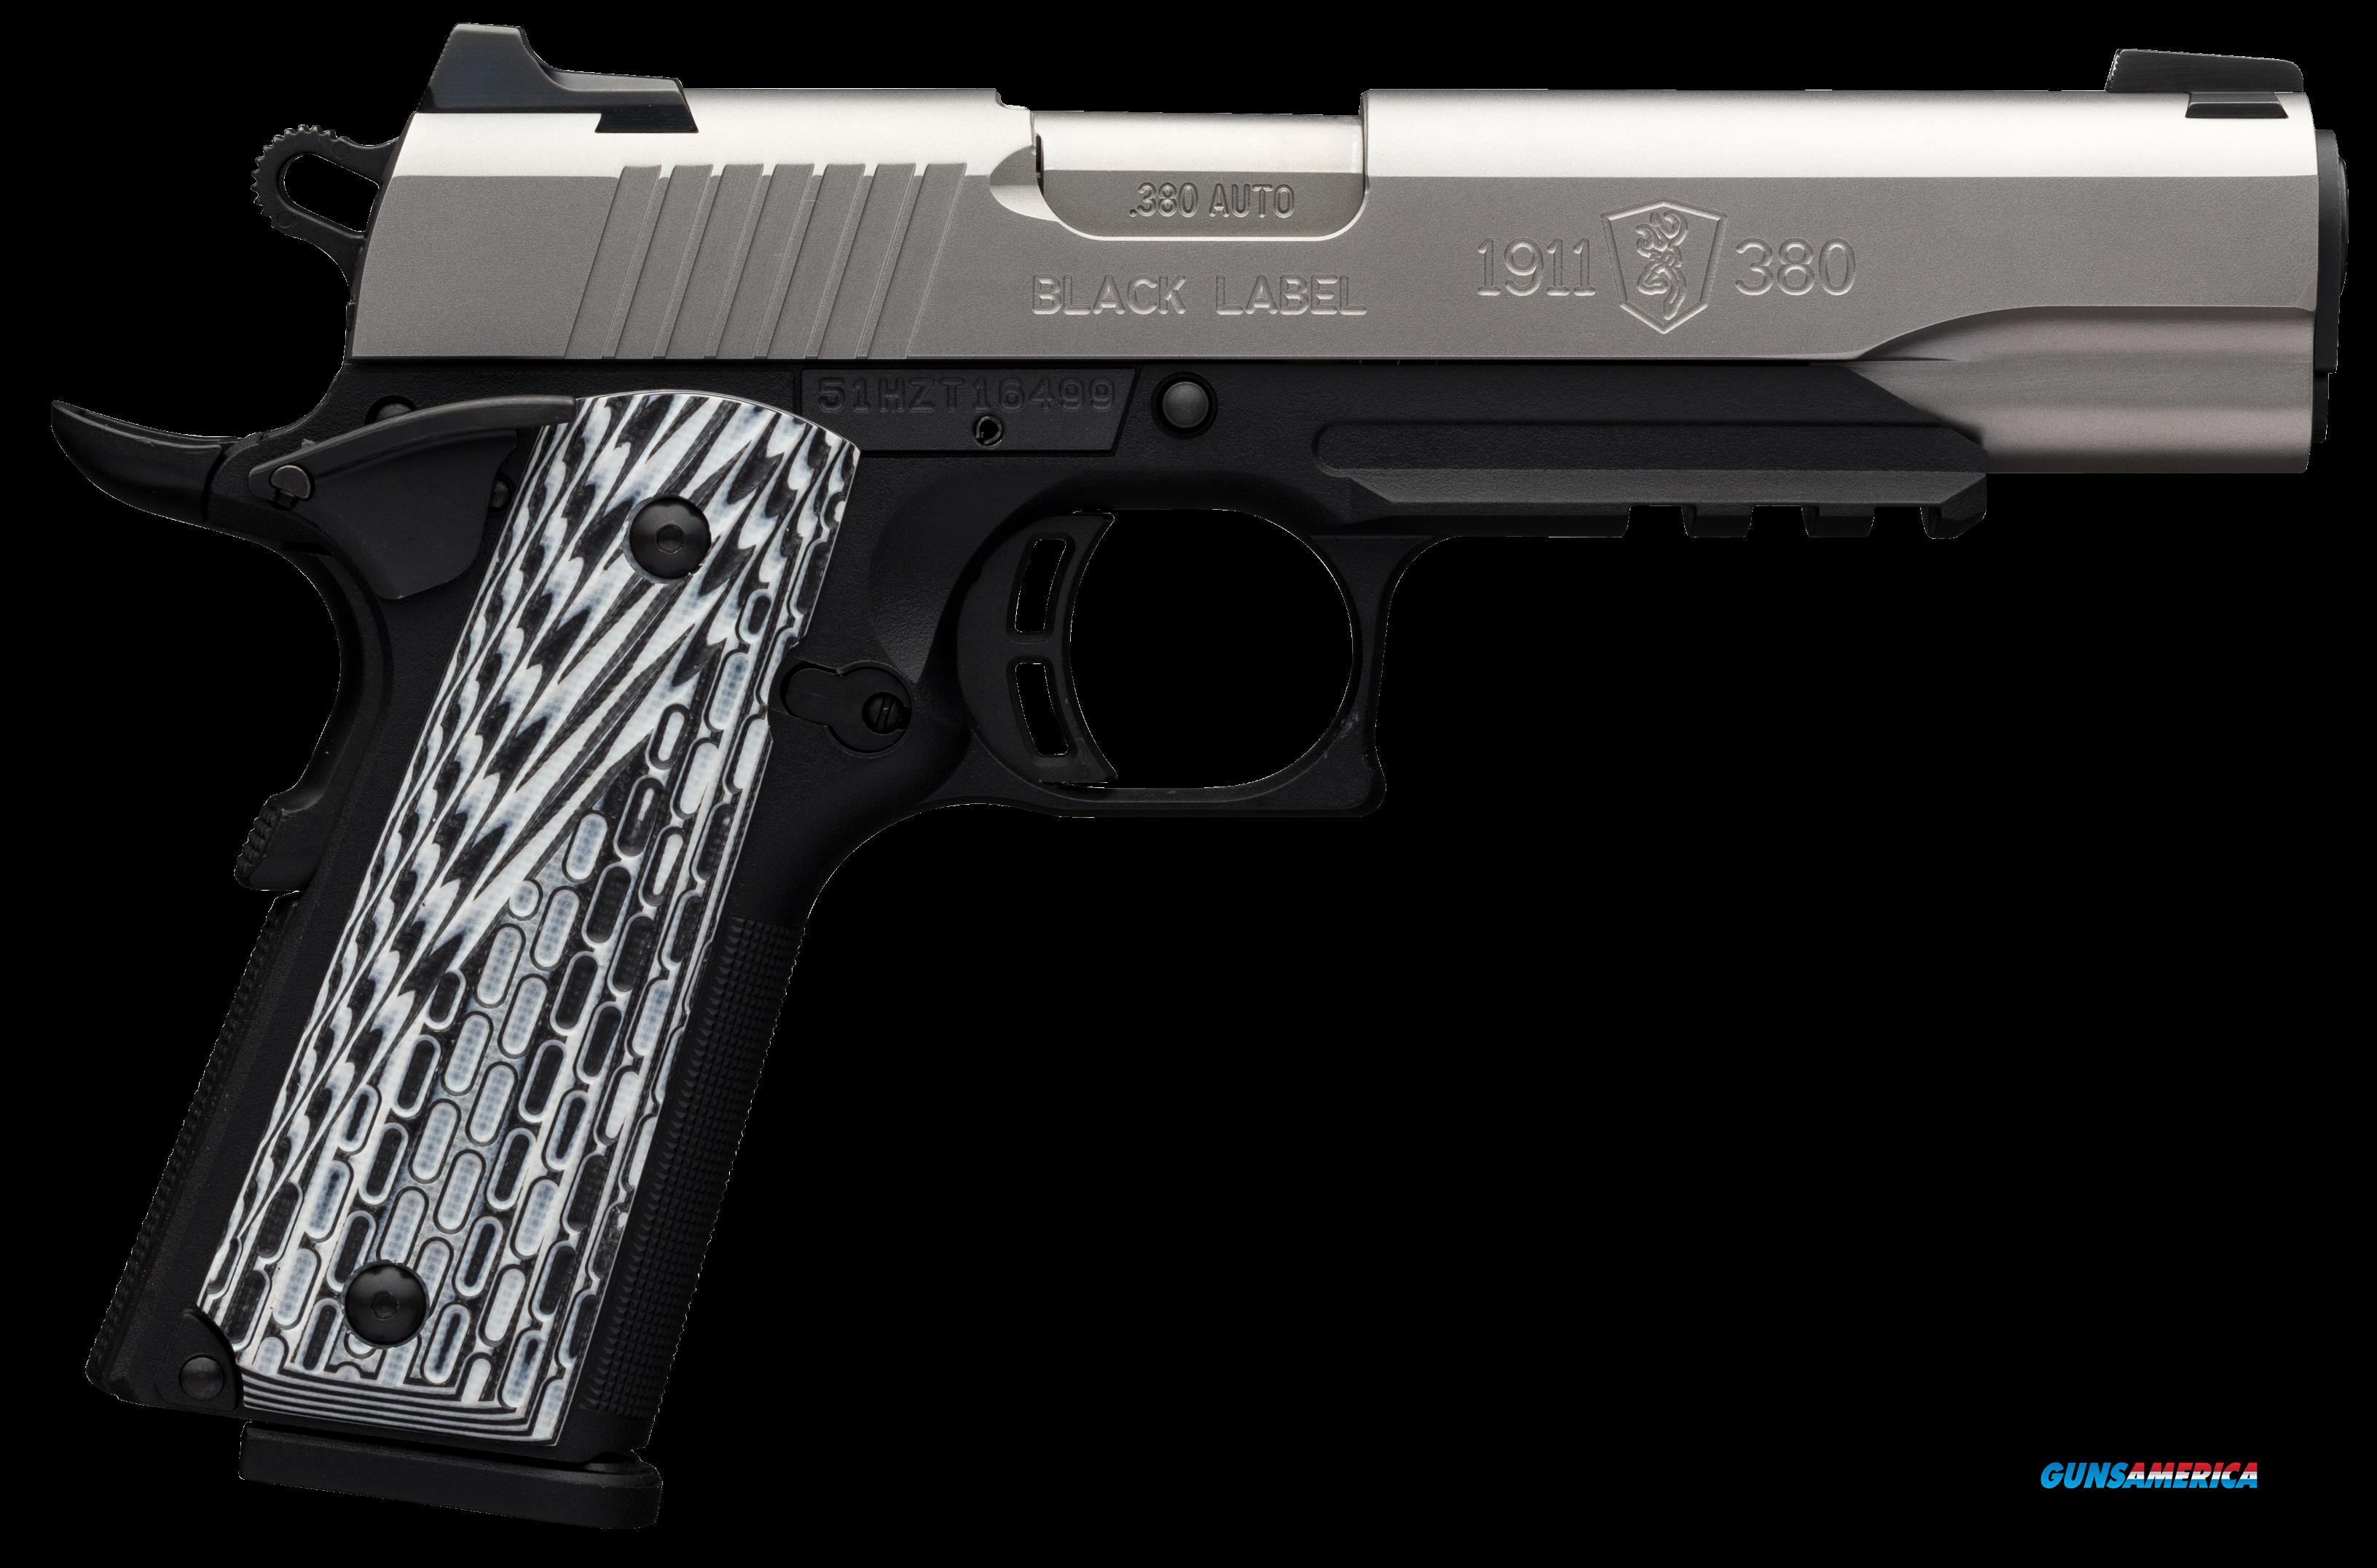 Browning 1911-380, Brn 051-927492 1911 380 Blklbl Pro 4.25 Ns Rail Ss  Guns > Pistols > 1911 Pistol Copies (non-Colt)